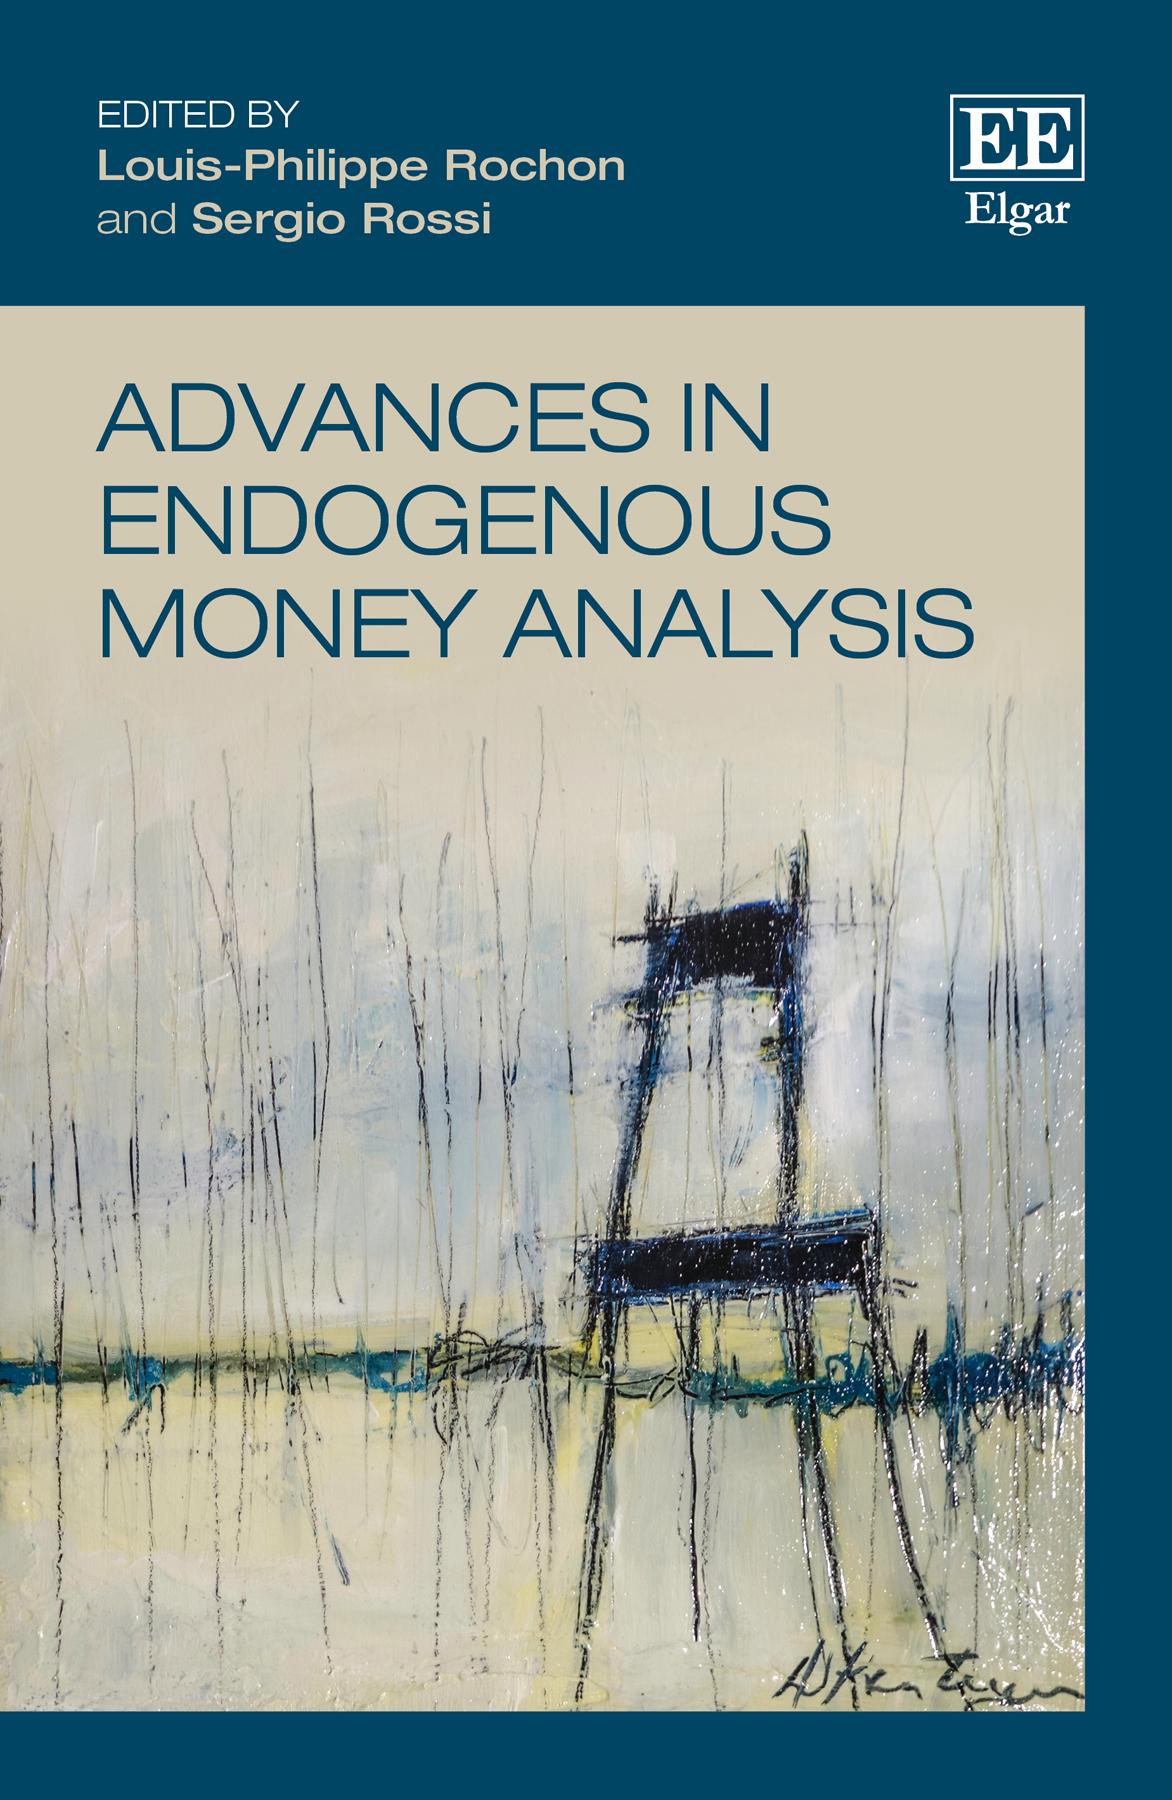 Download Ebook Advances in Endogenous Money Analysis by Louis-Philippe Rochon Pdf